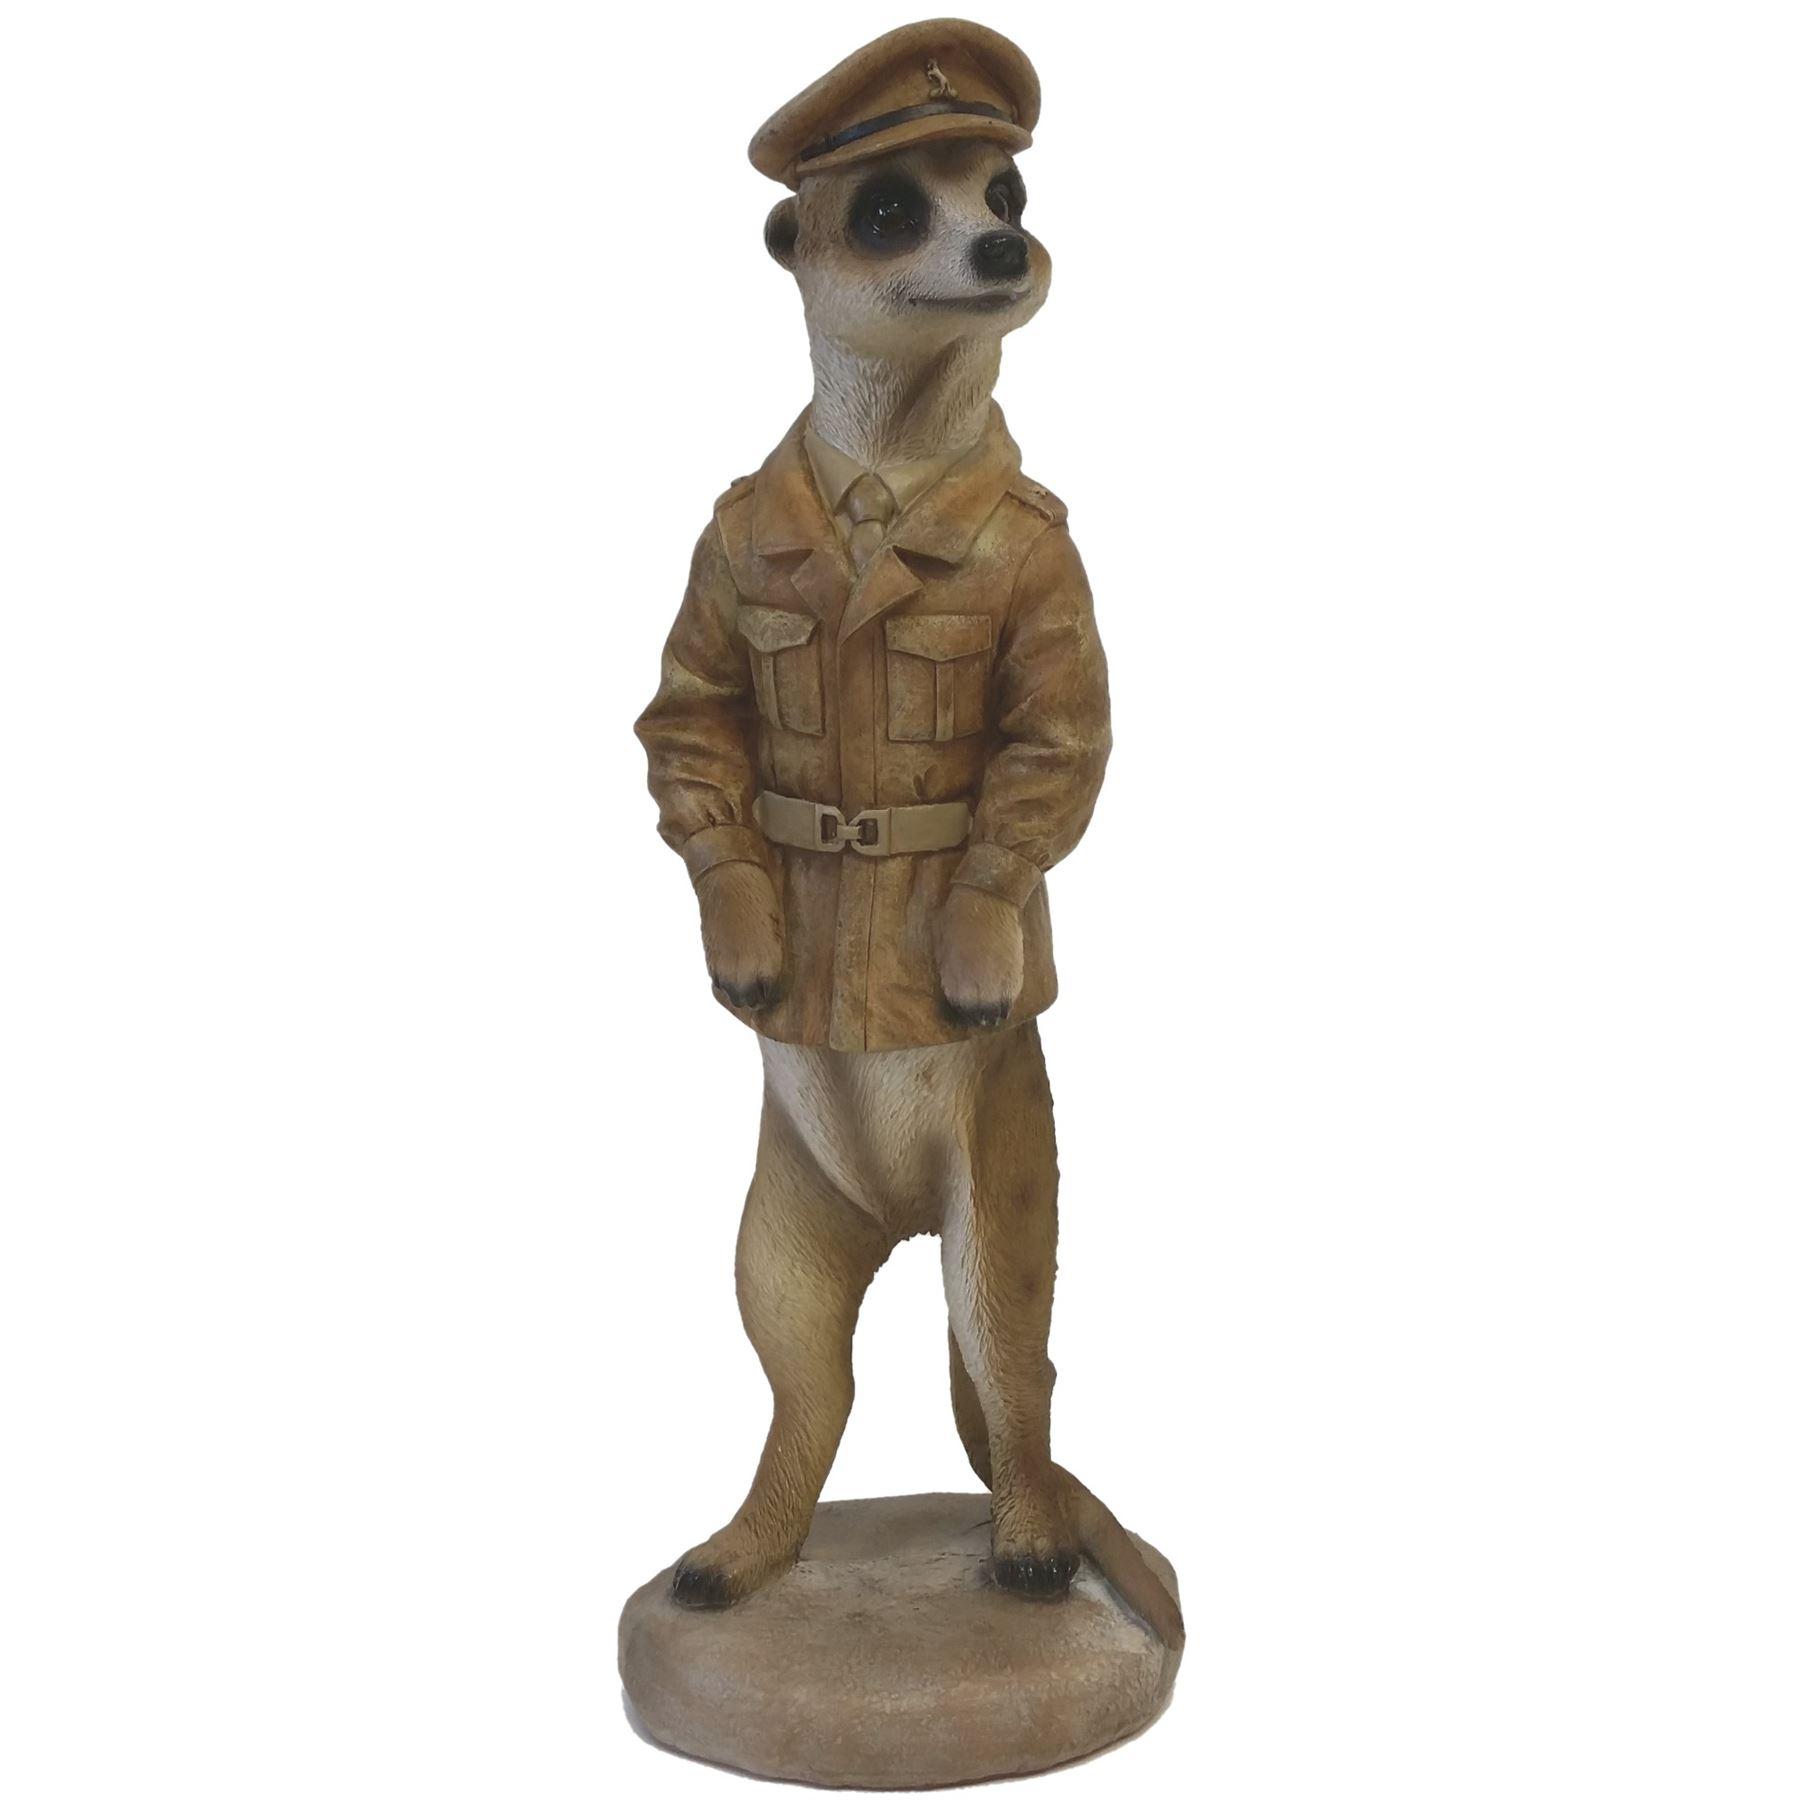 Meerkat Ornament Figurine Garden Or Home 28cm Tall Ebay